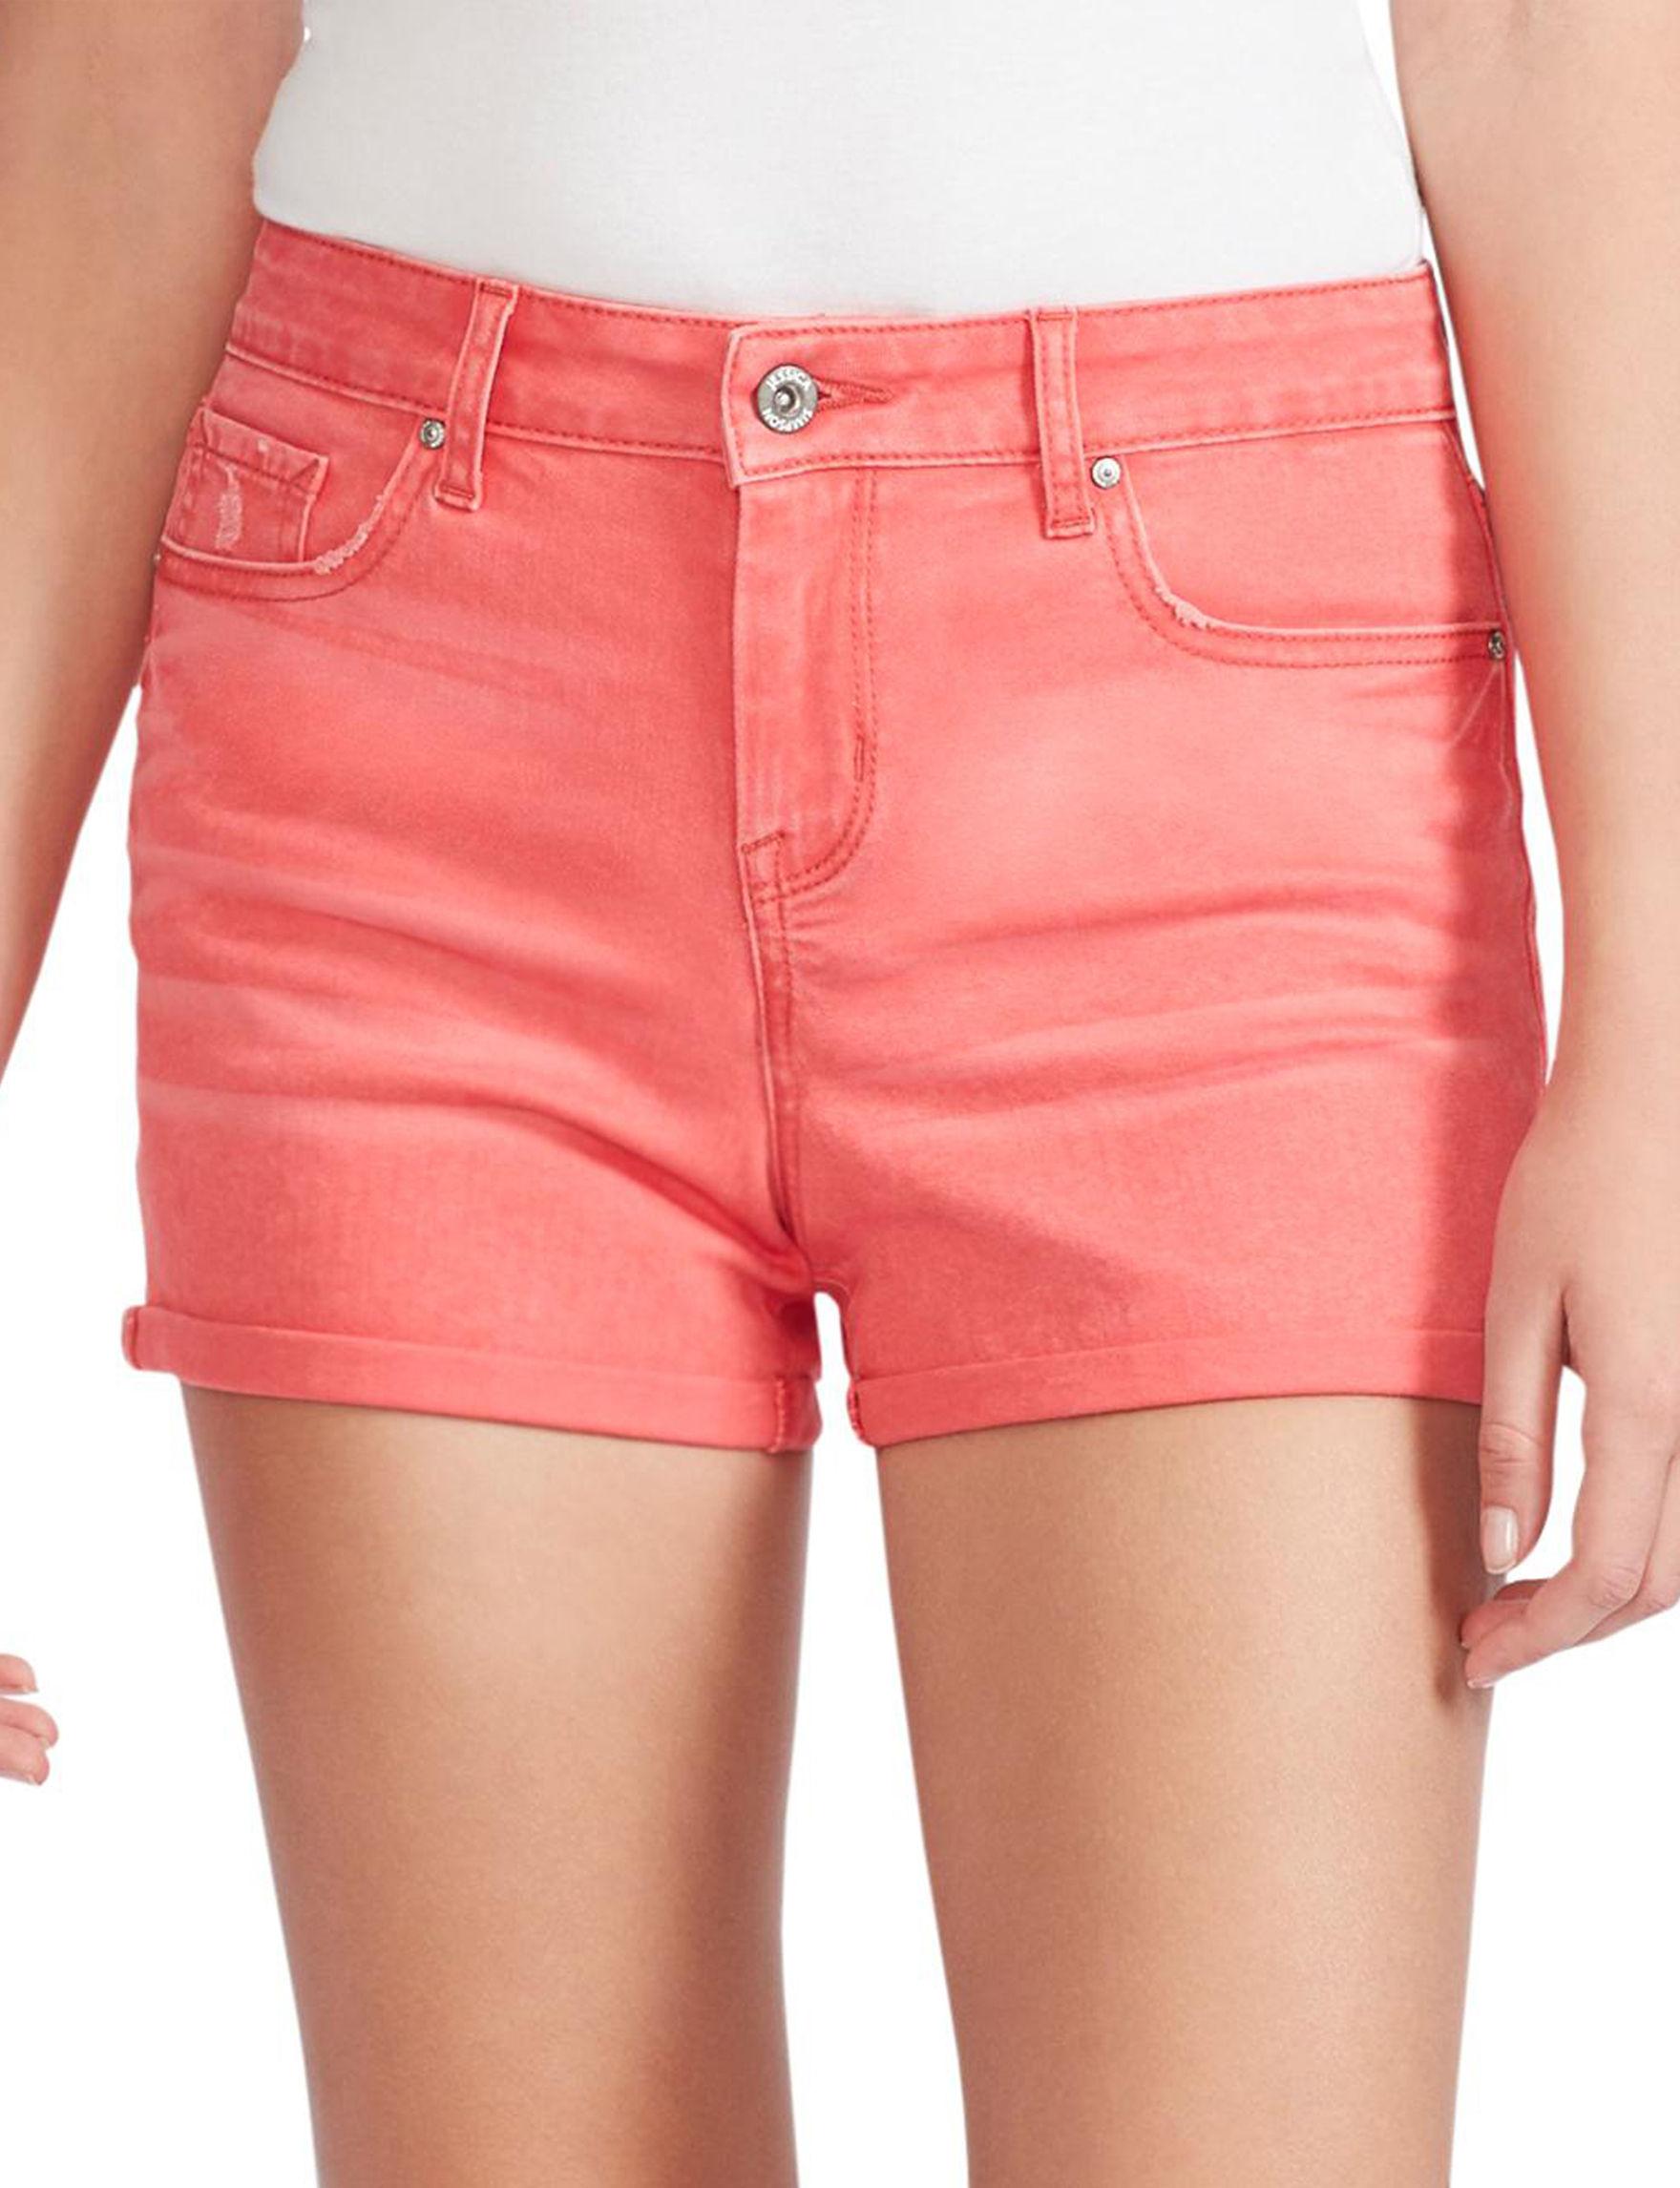 Jessica Simpson Cayenne Denim Shorts